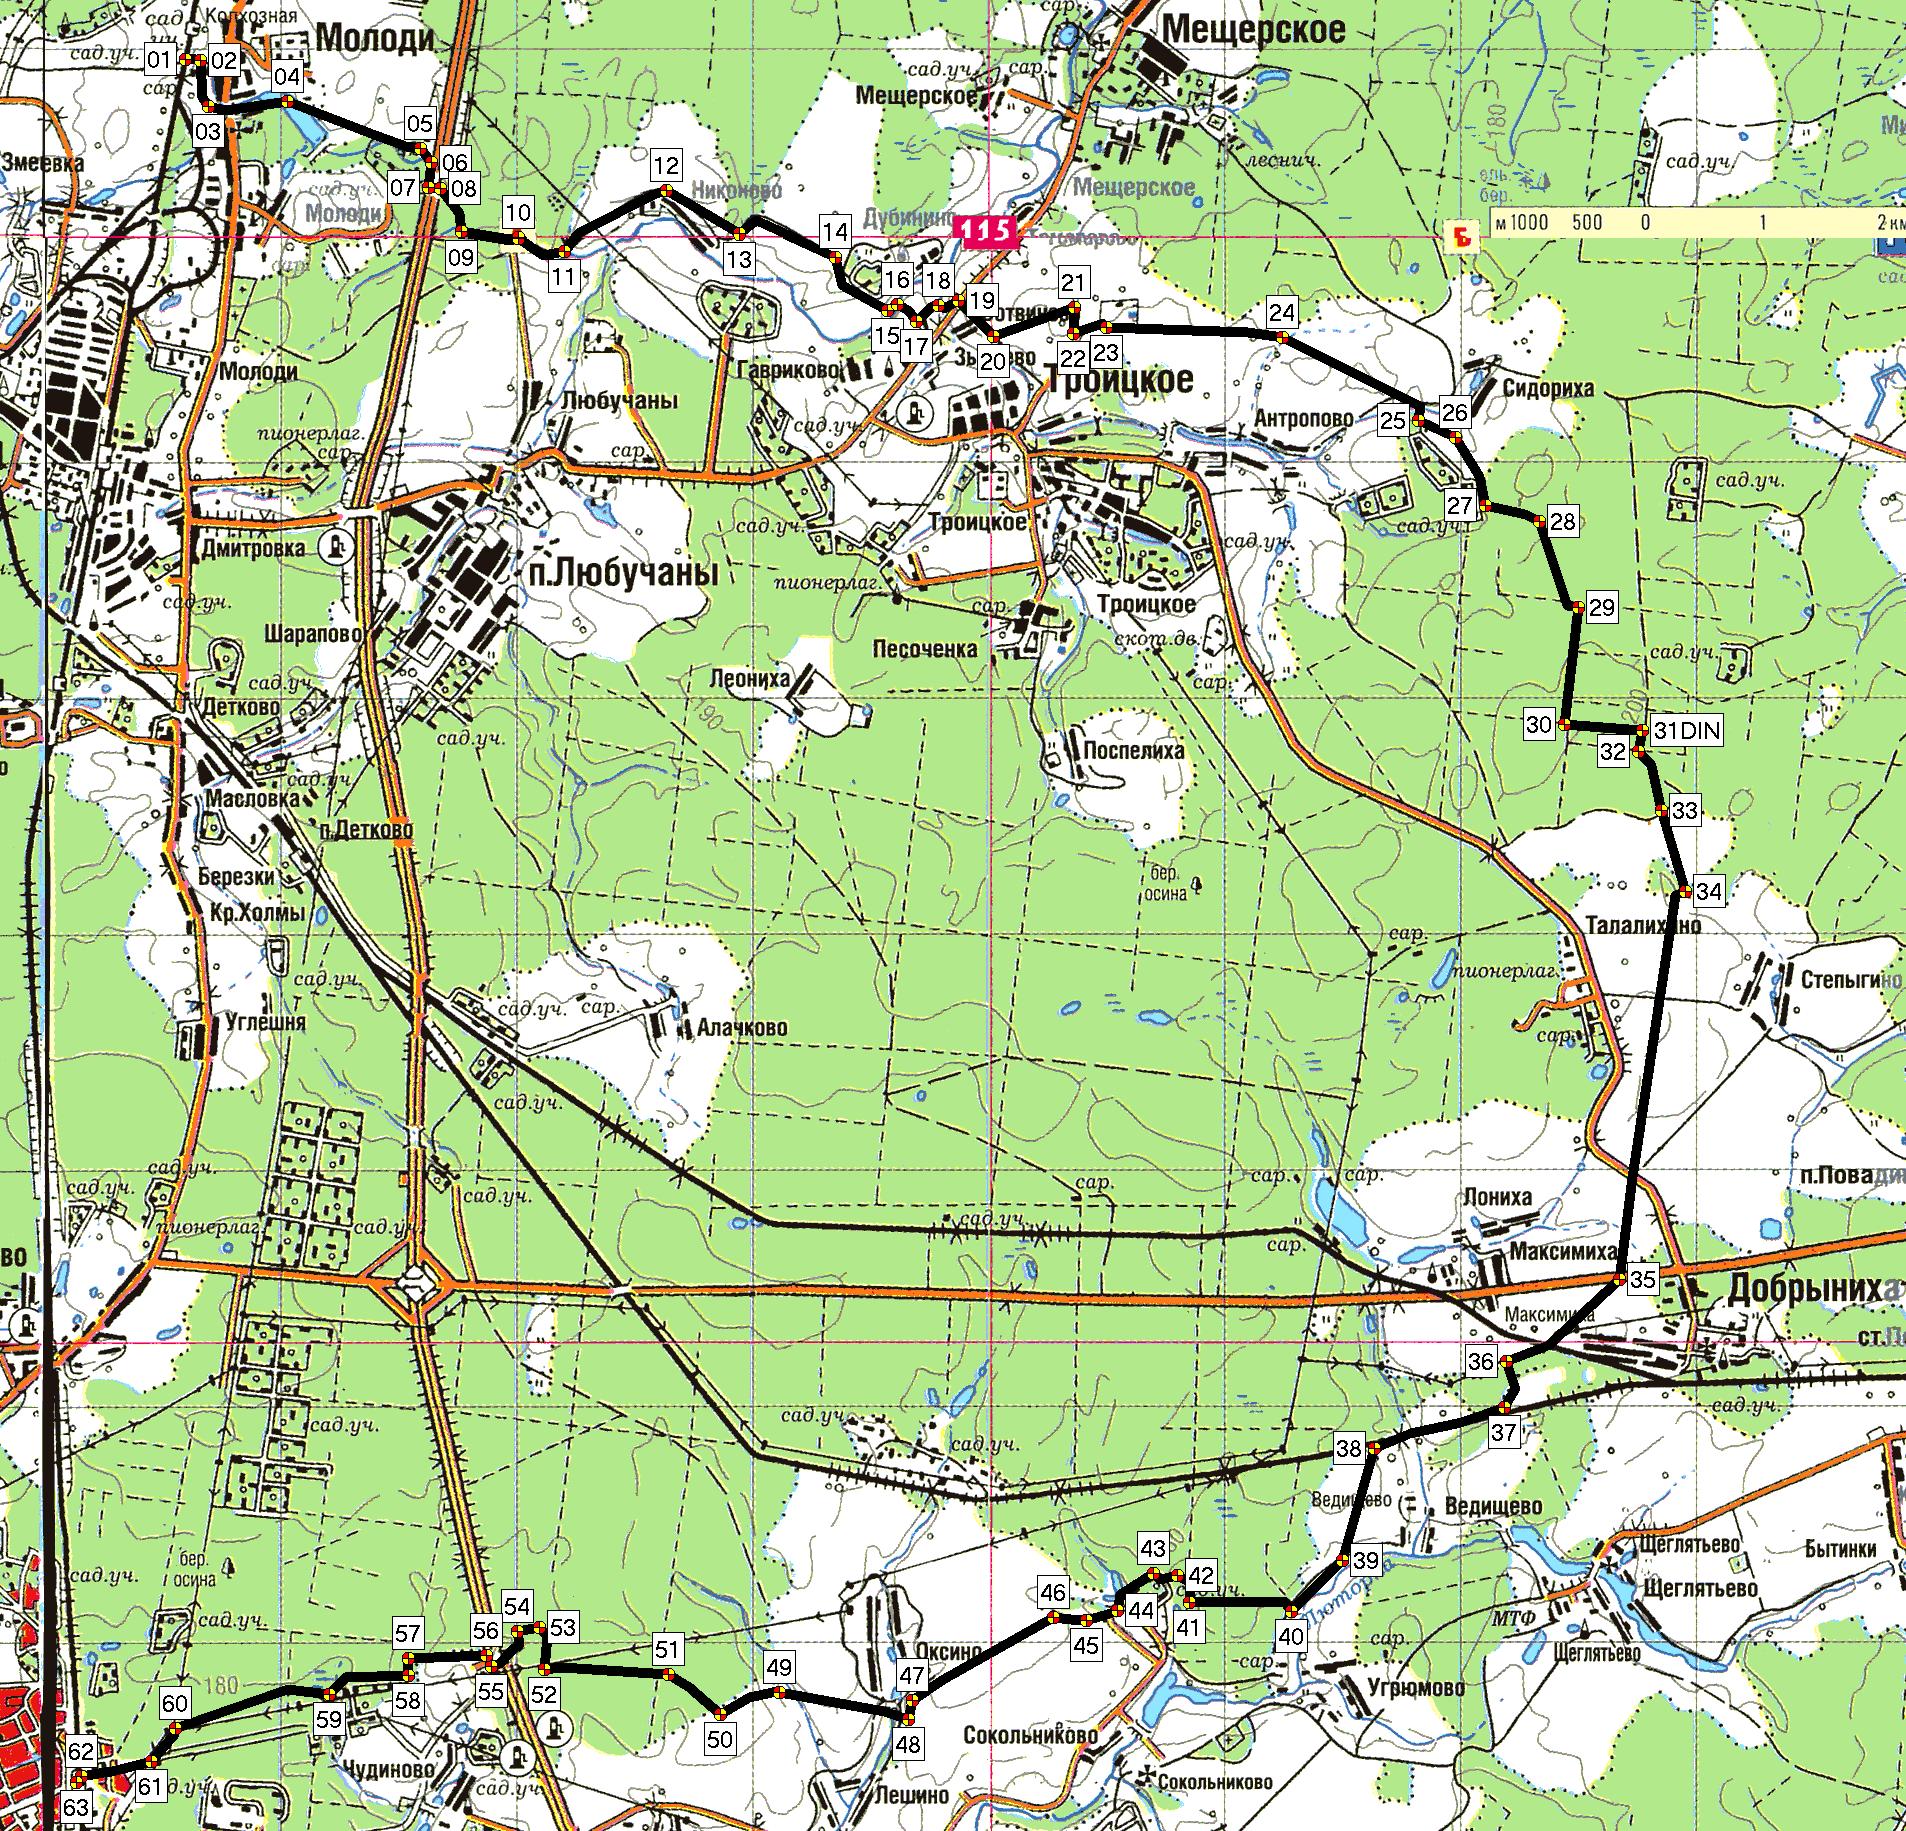 http://turpohod.narod.ru/treks/ser_kolh-cheh/kolh-cheh_map.png